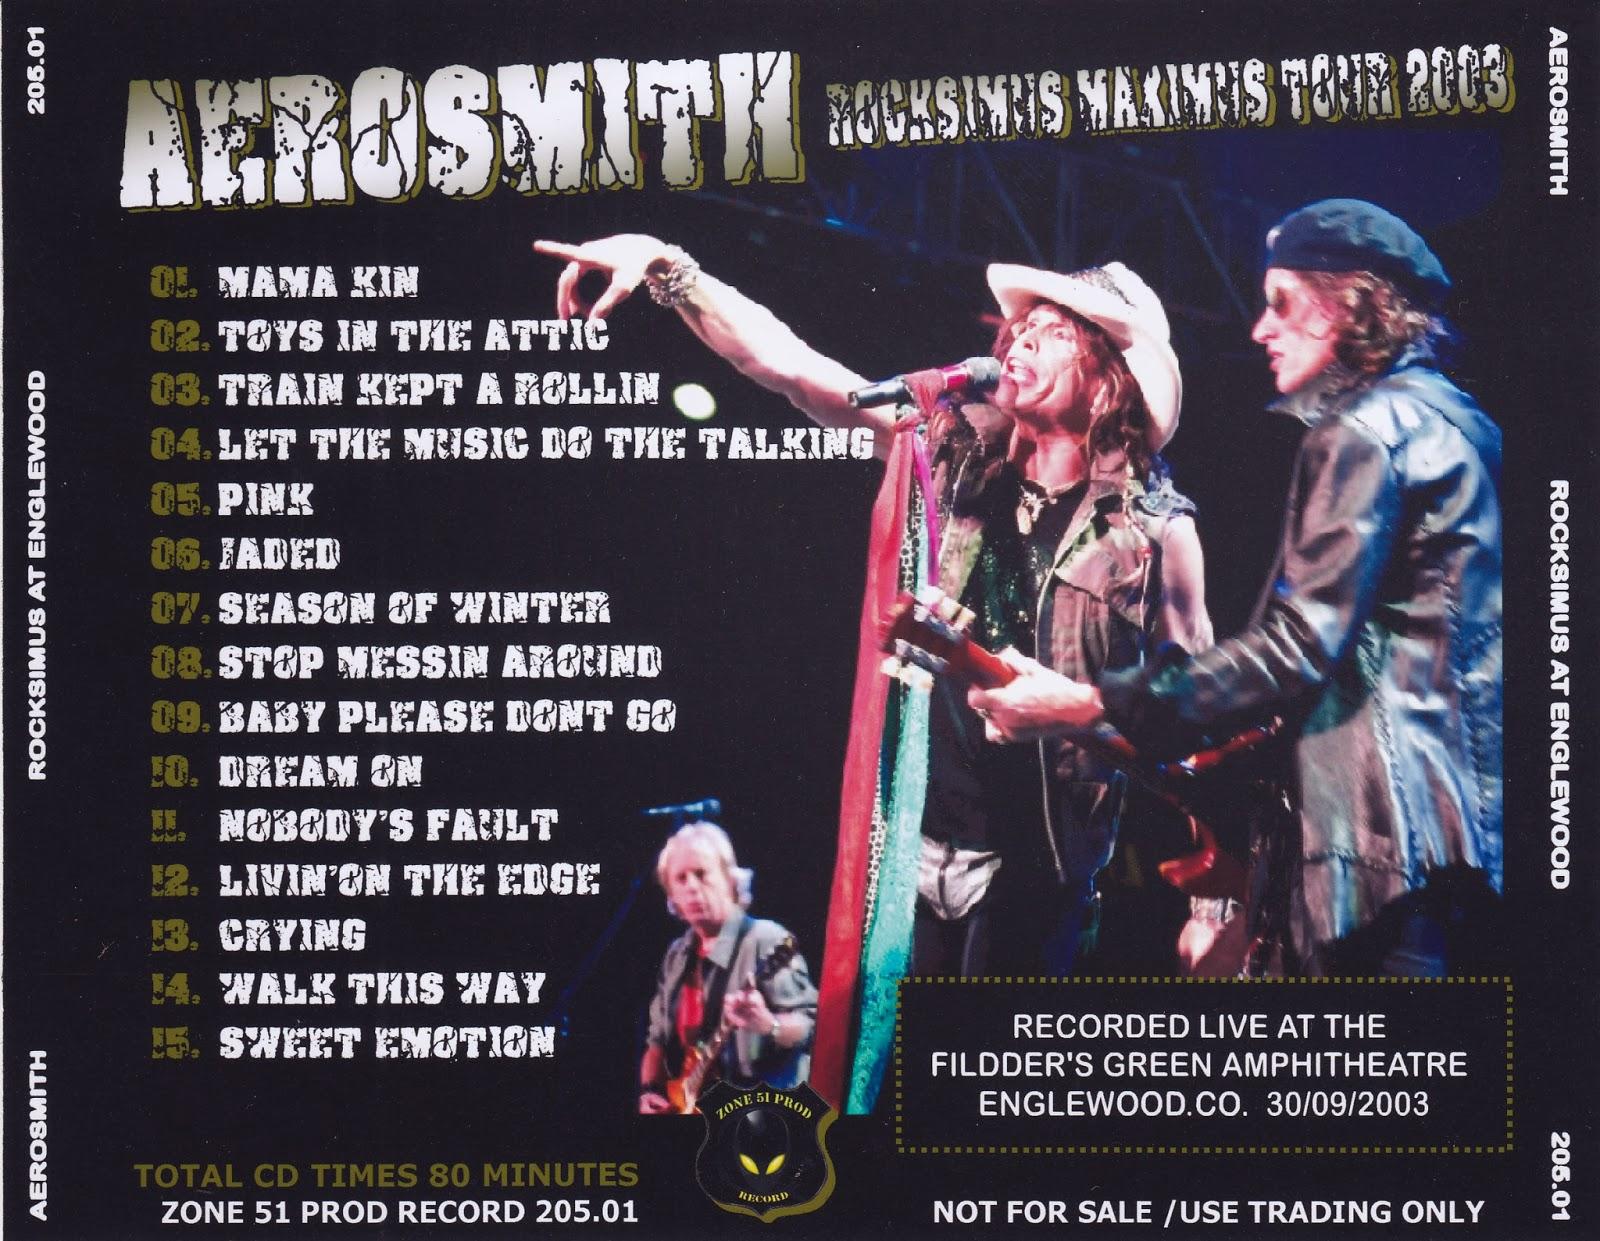 Aerosmith Bootlegs Cover Arts Rocksimus At Englewood